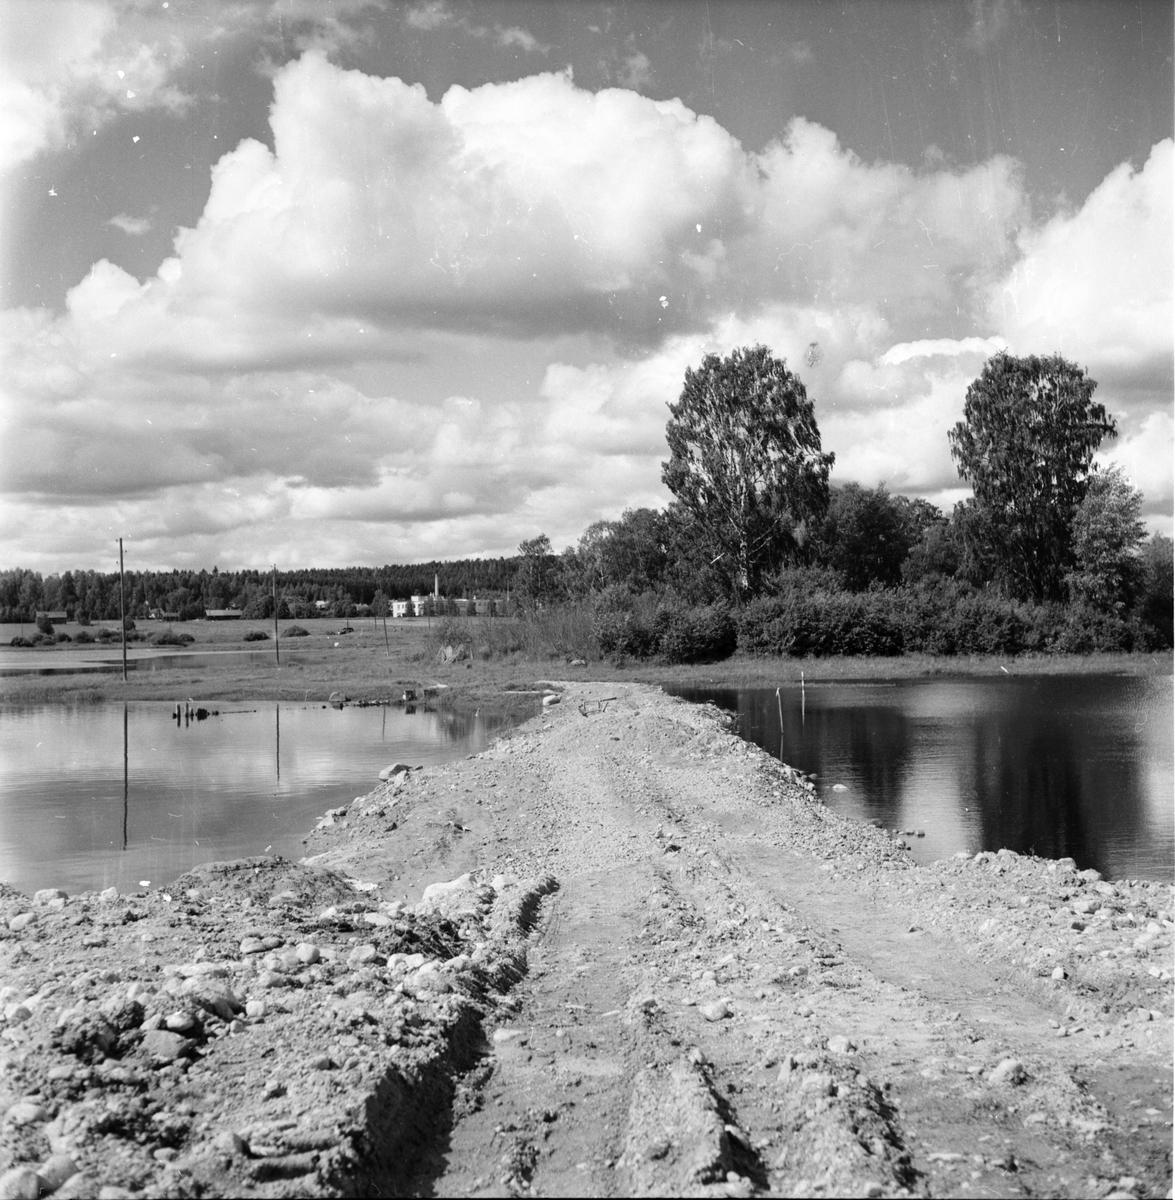 Vågen, Dammen, Stadsing St Sandström. Bild 12 Juli 1957